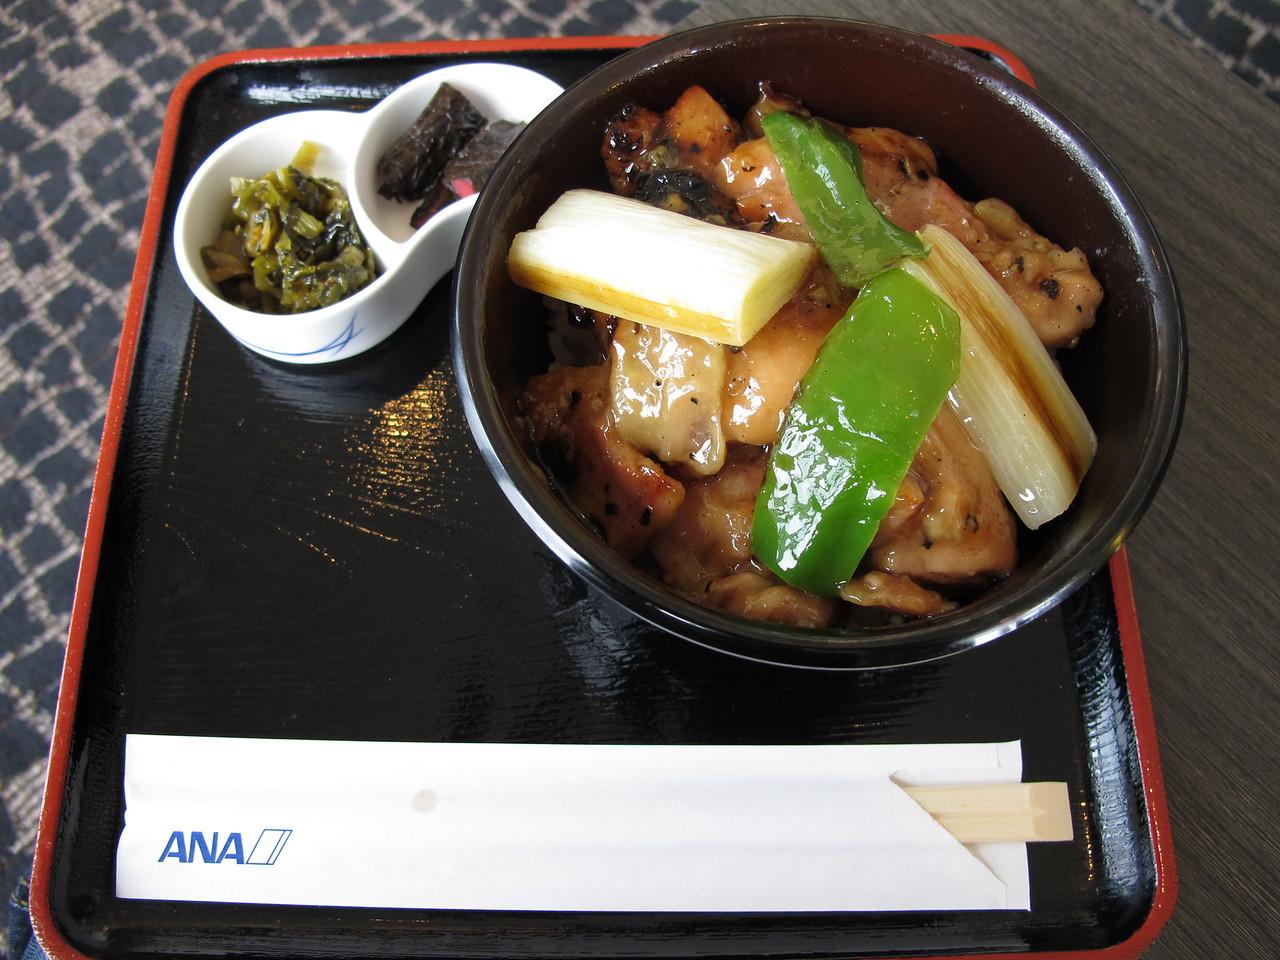 Grilled chicken donburi with leek, and tsukemono. ANA Suite Lounge, NRT/RJAA.